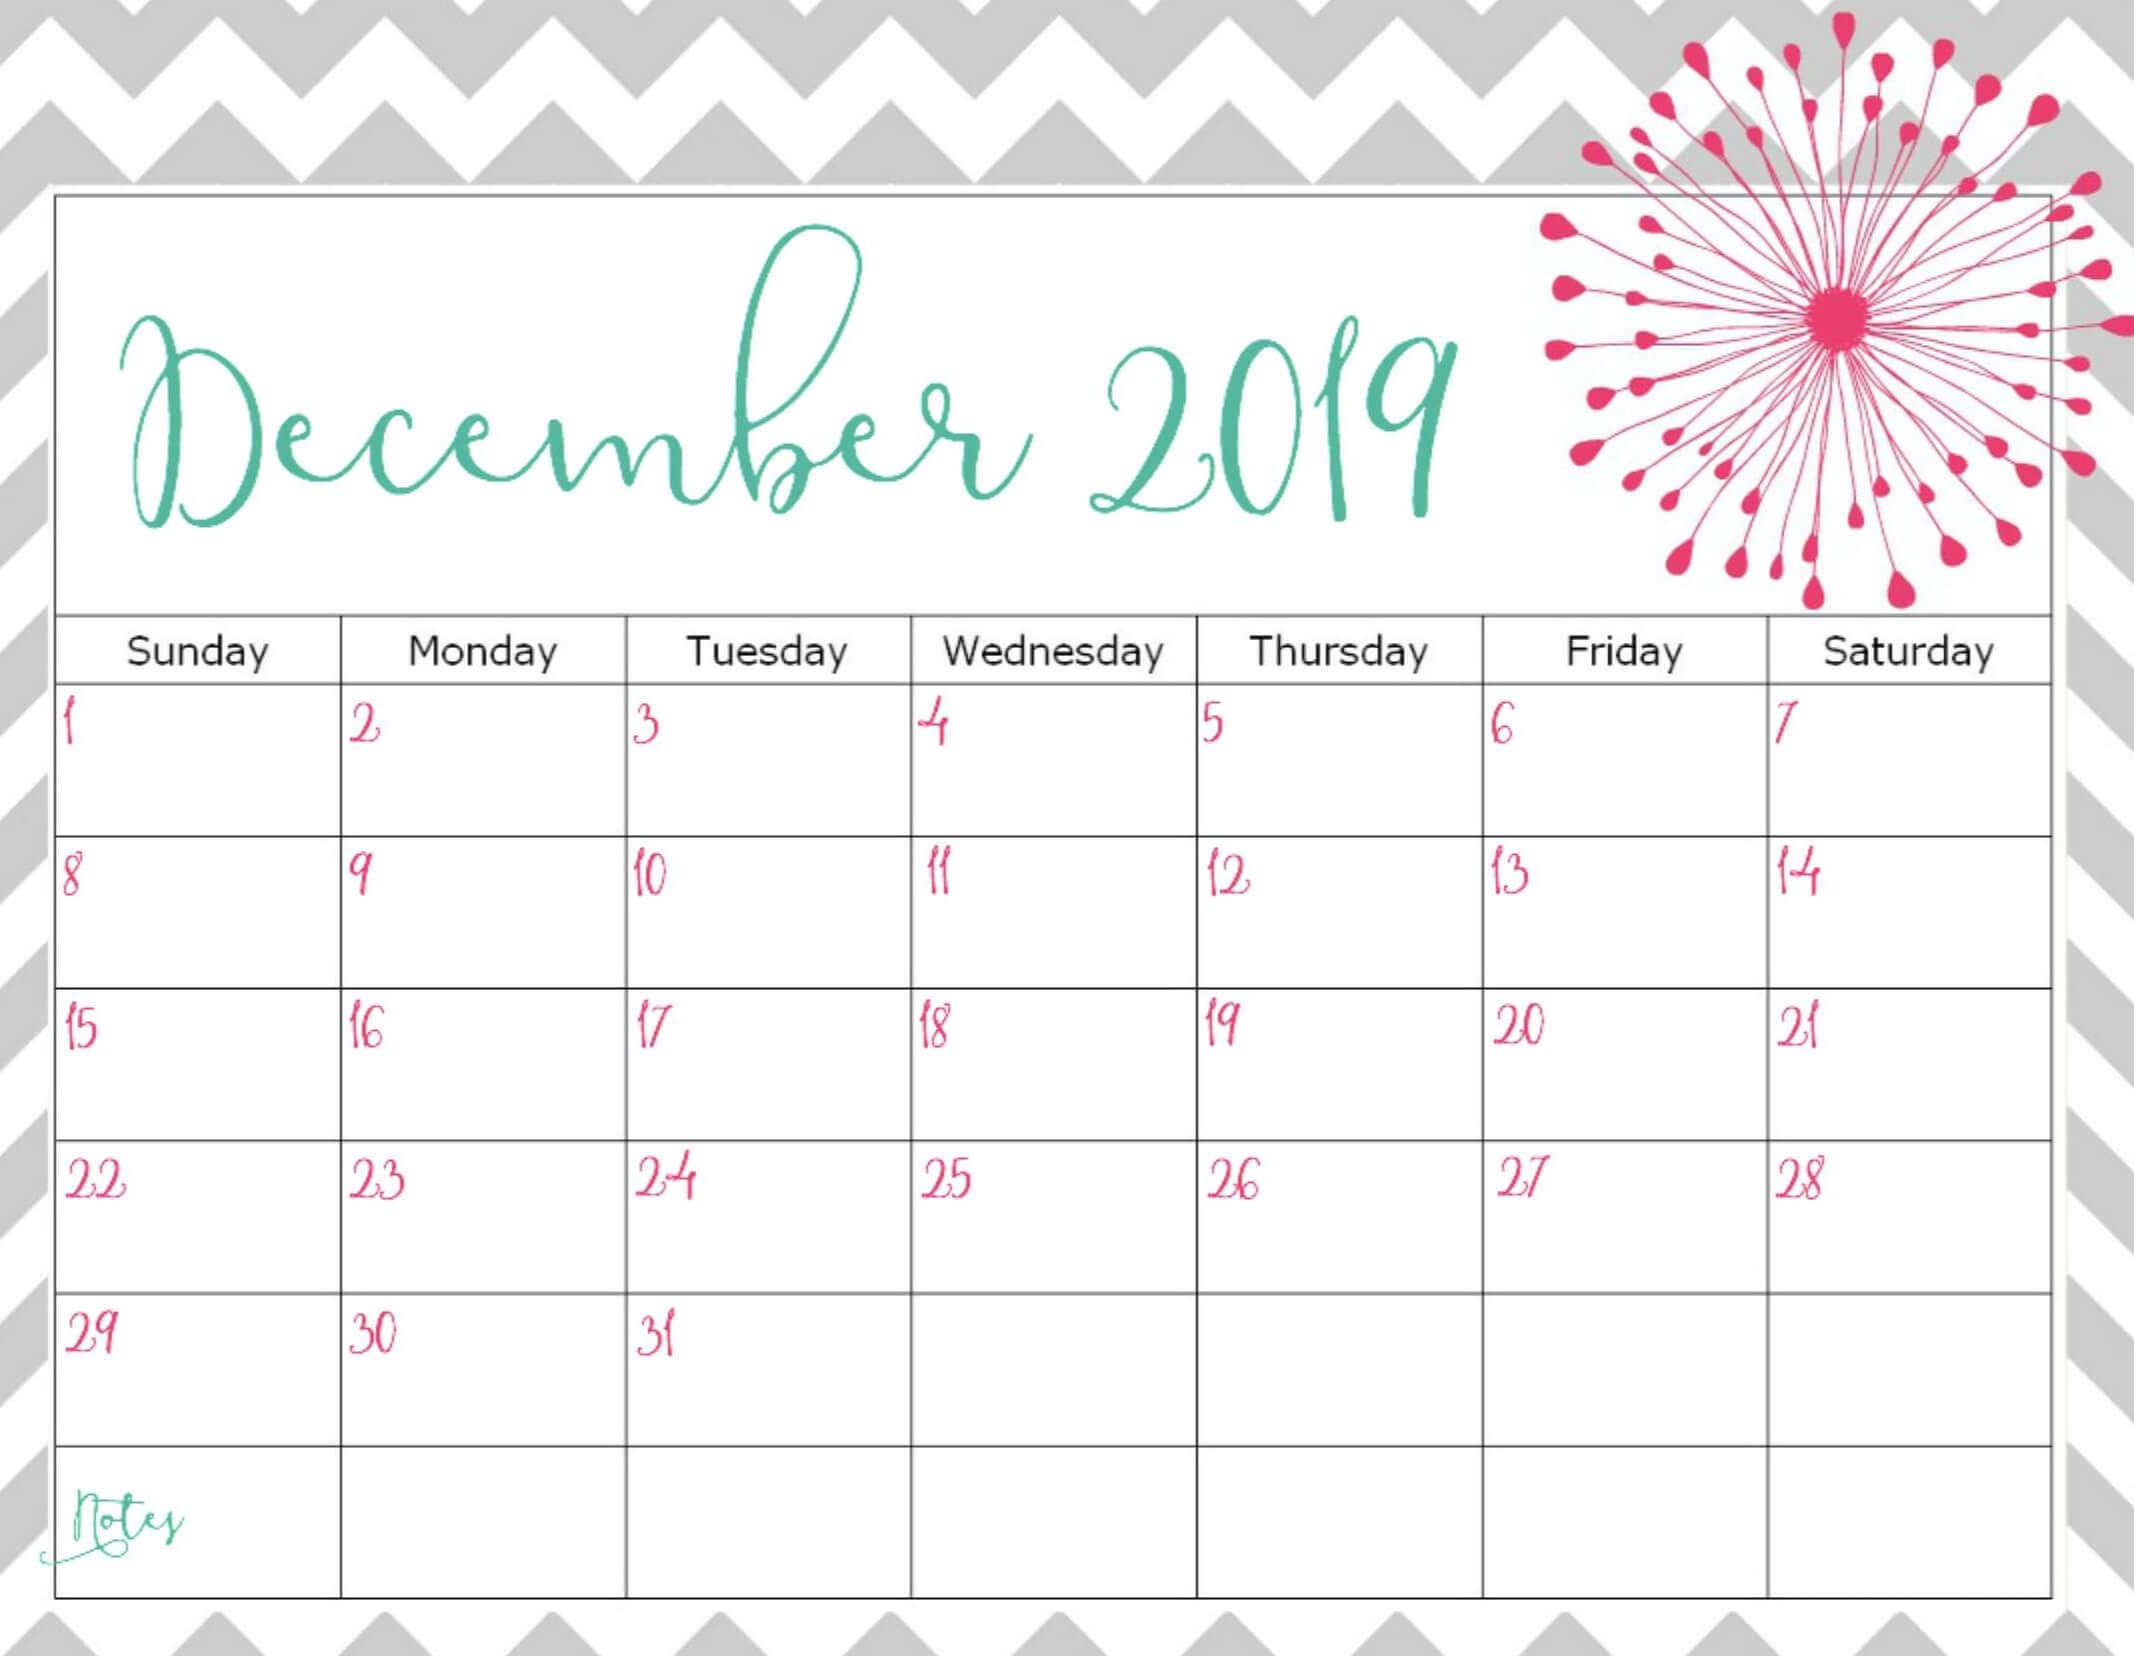 Free Printable Calendar December 2019 Template - Set Your